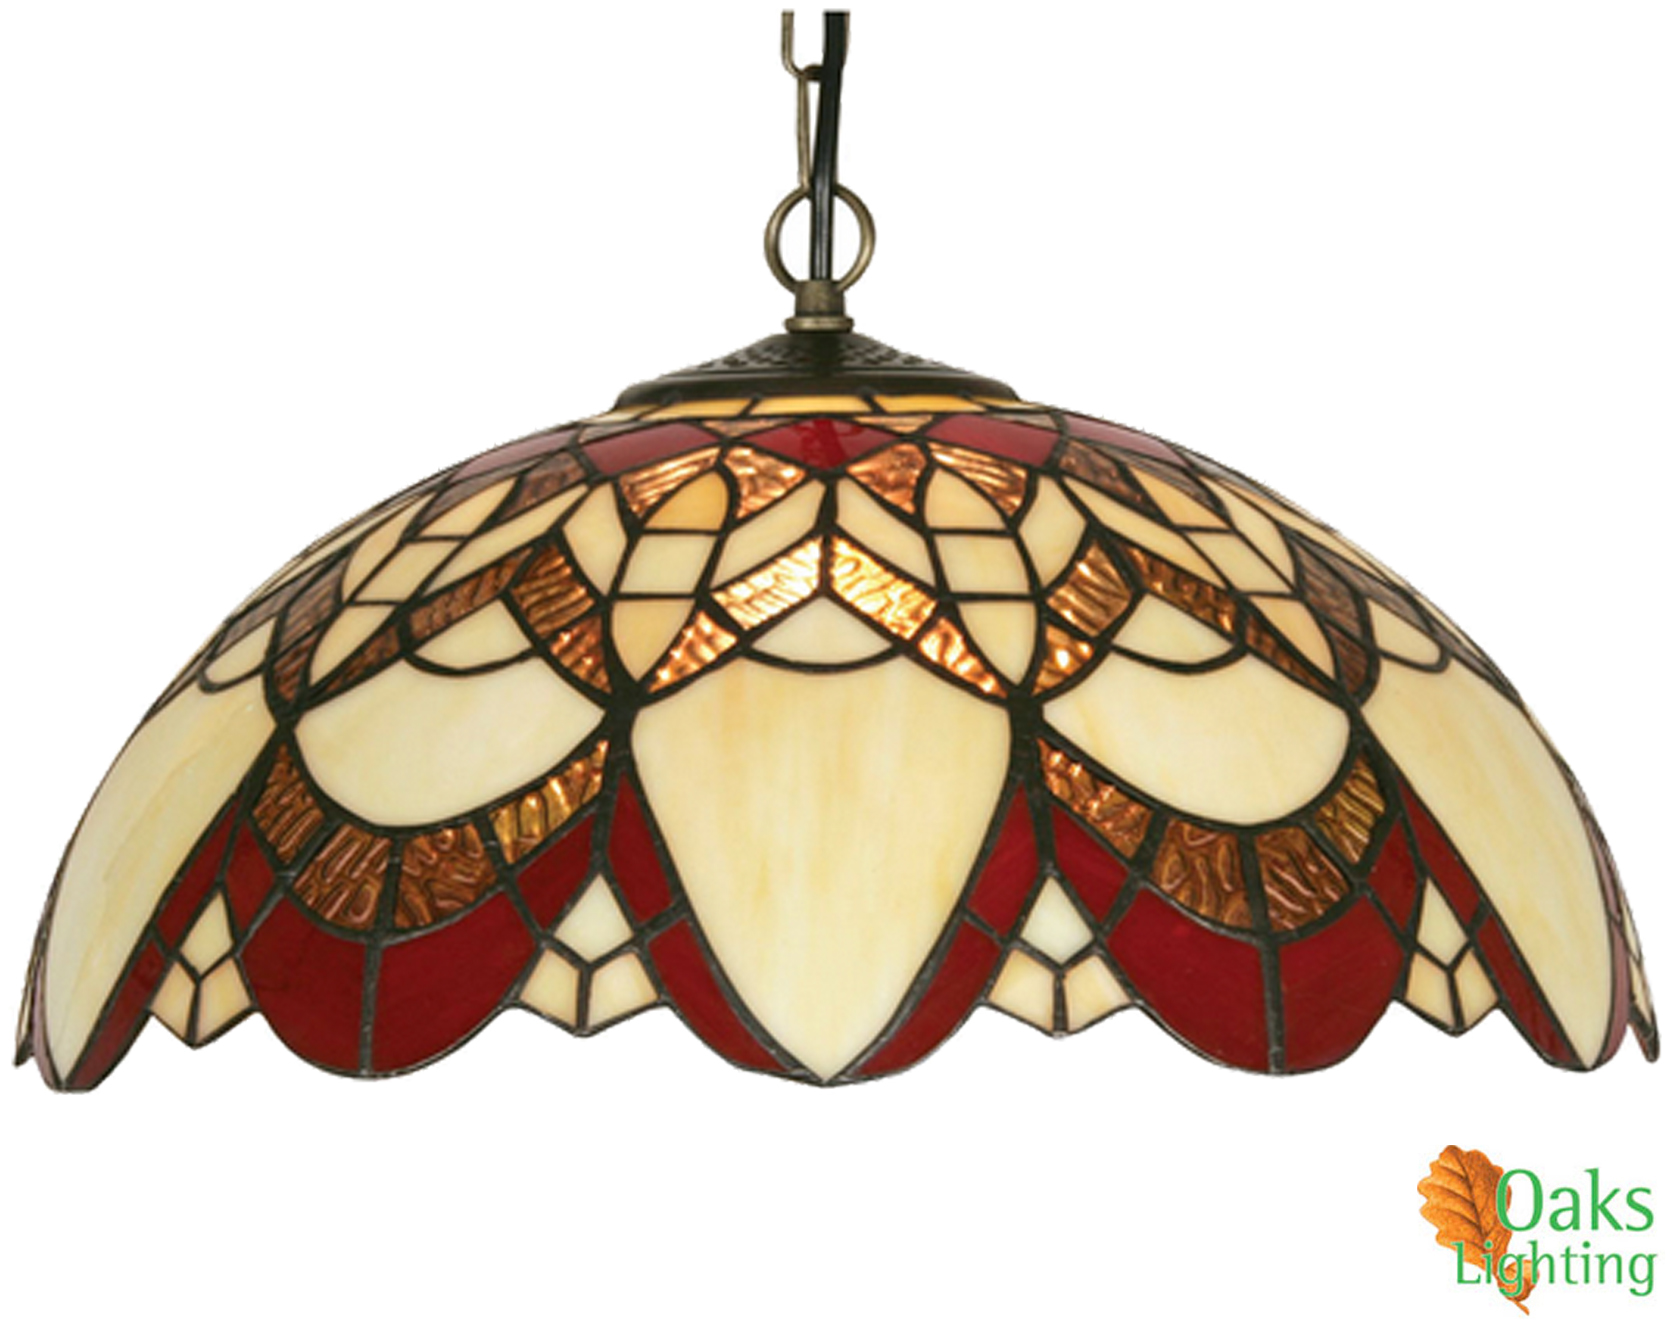 Oaks Lighting U0027Caiusu0027 Tiffany Ceiling Light   OT 5234/16 P None